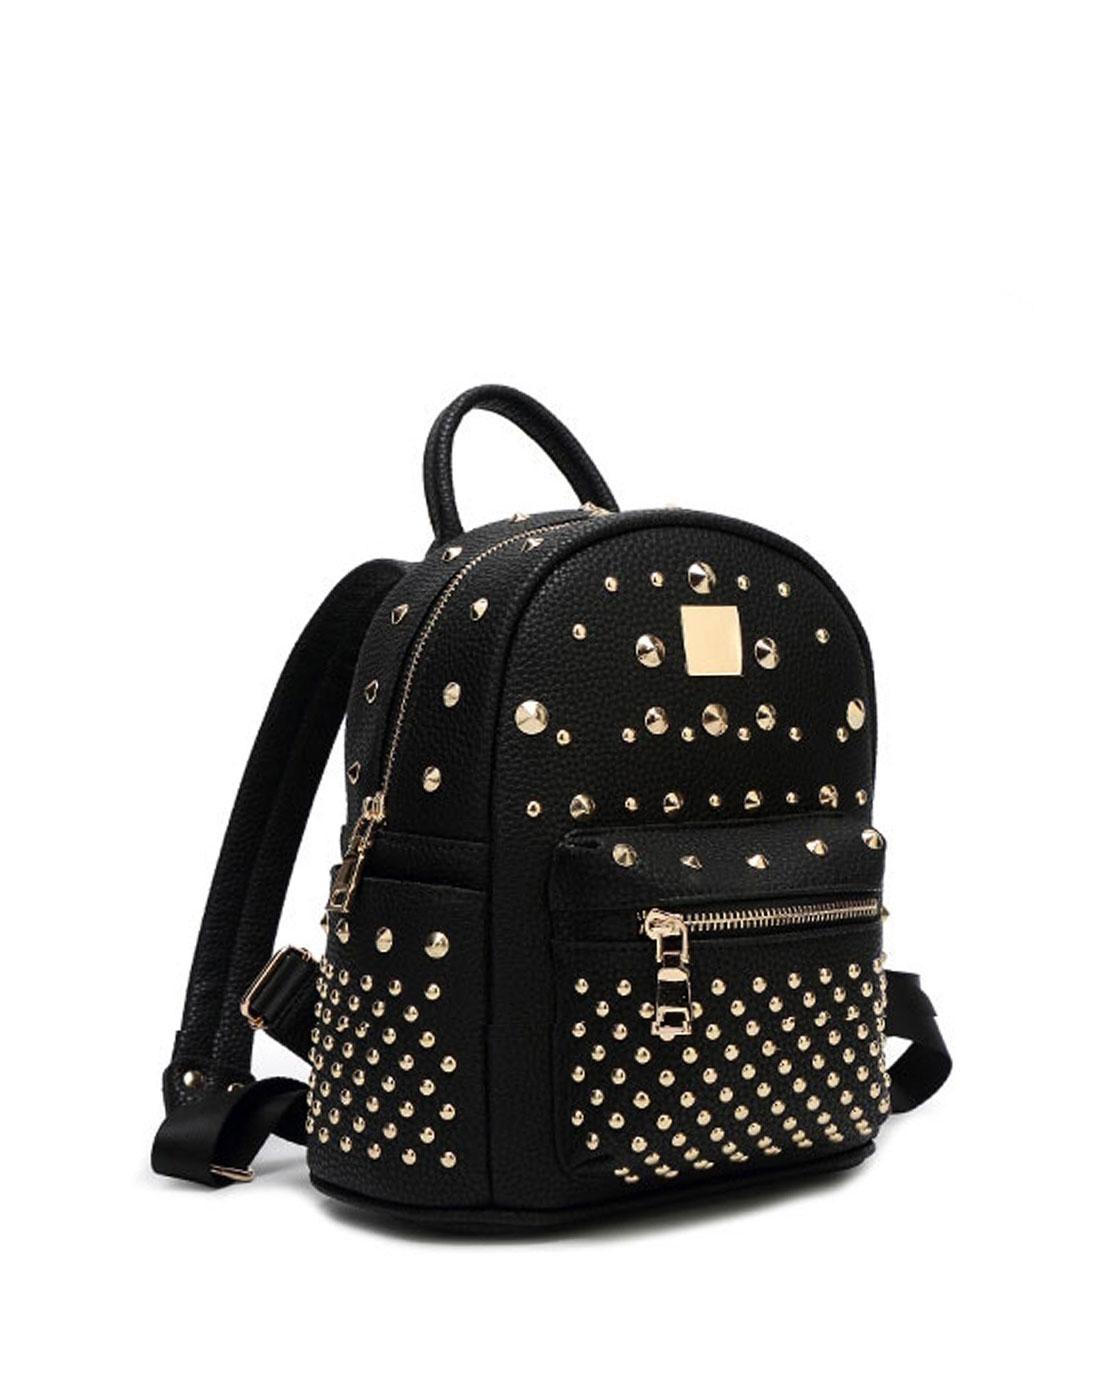 AdoreWe #VIPme Backpacks - SVMONO Black School Bags Backpacks for ...